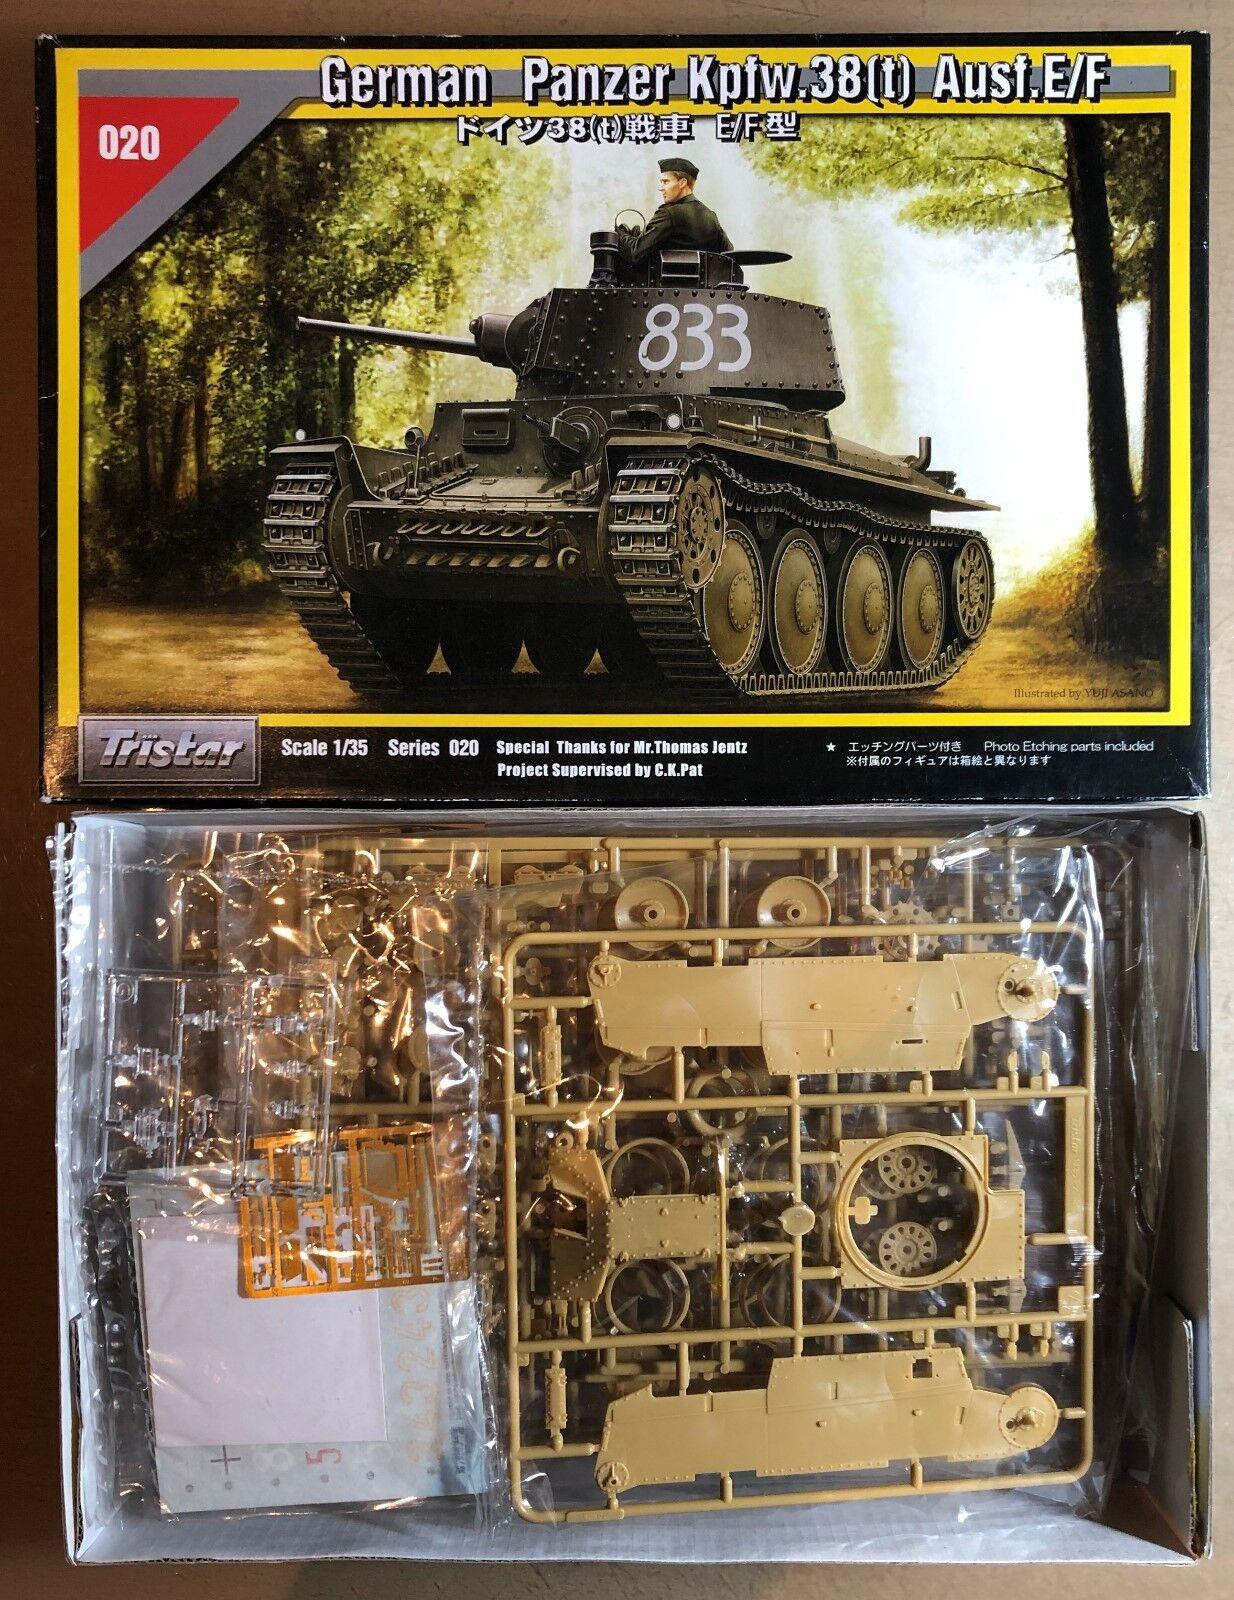 TRISTAR 35020 - GERMAN PANZER PLASTIC Kpfw38(t) Ausf.E/F - 1/35 PLASTIC PANZER KIT 0842aa